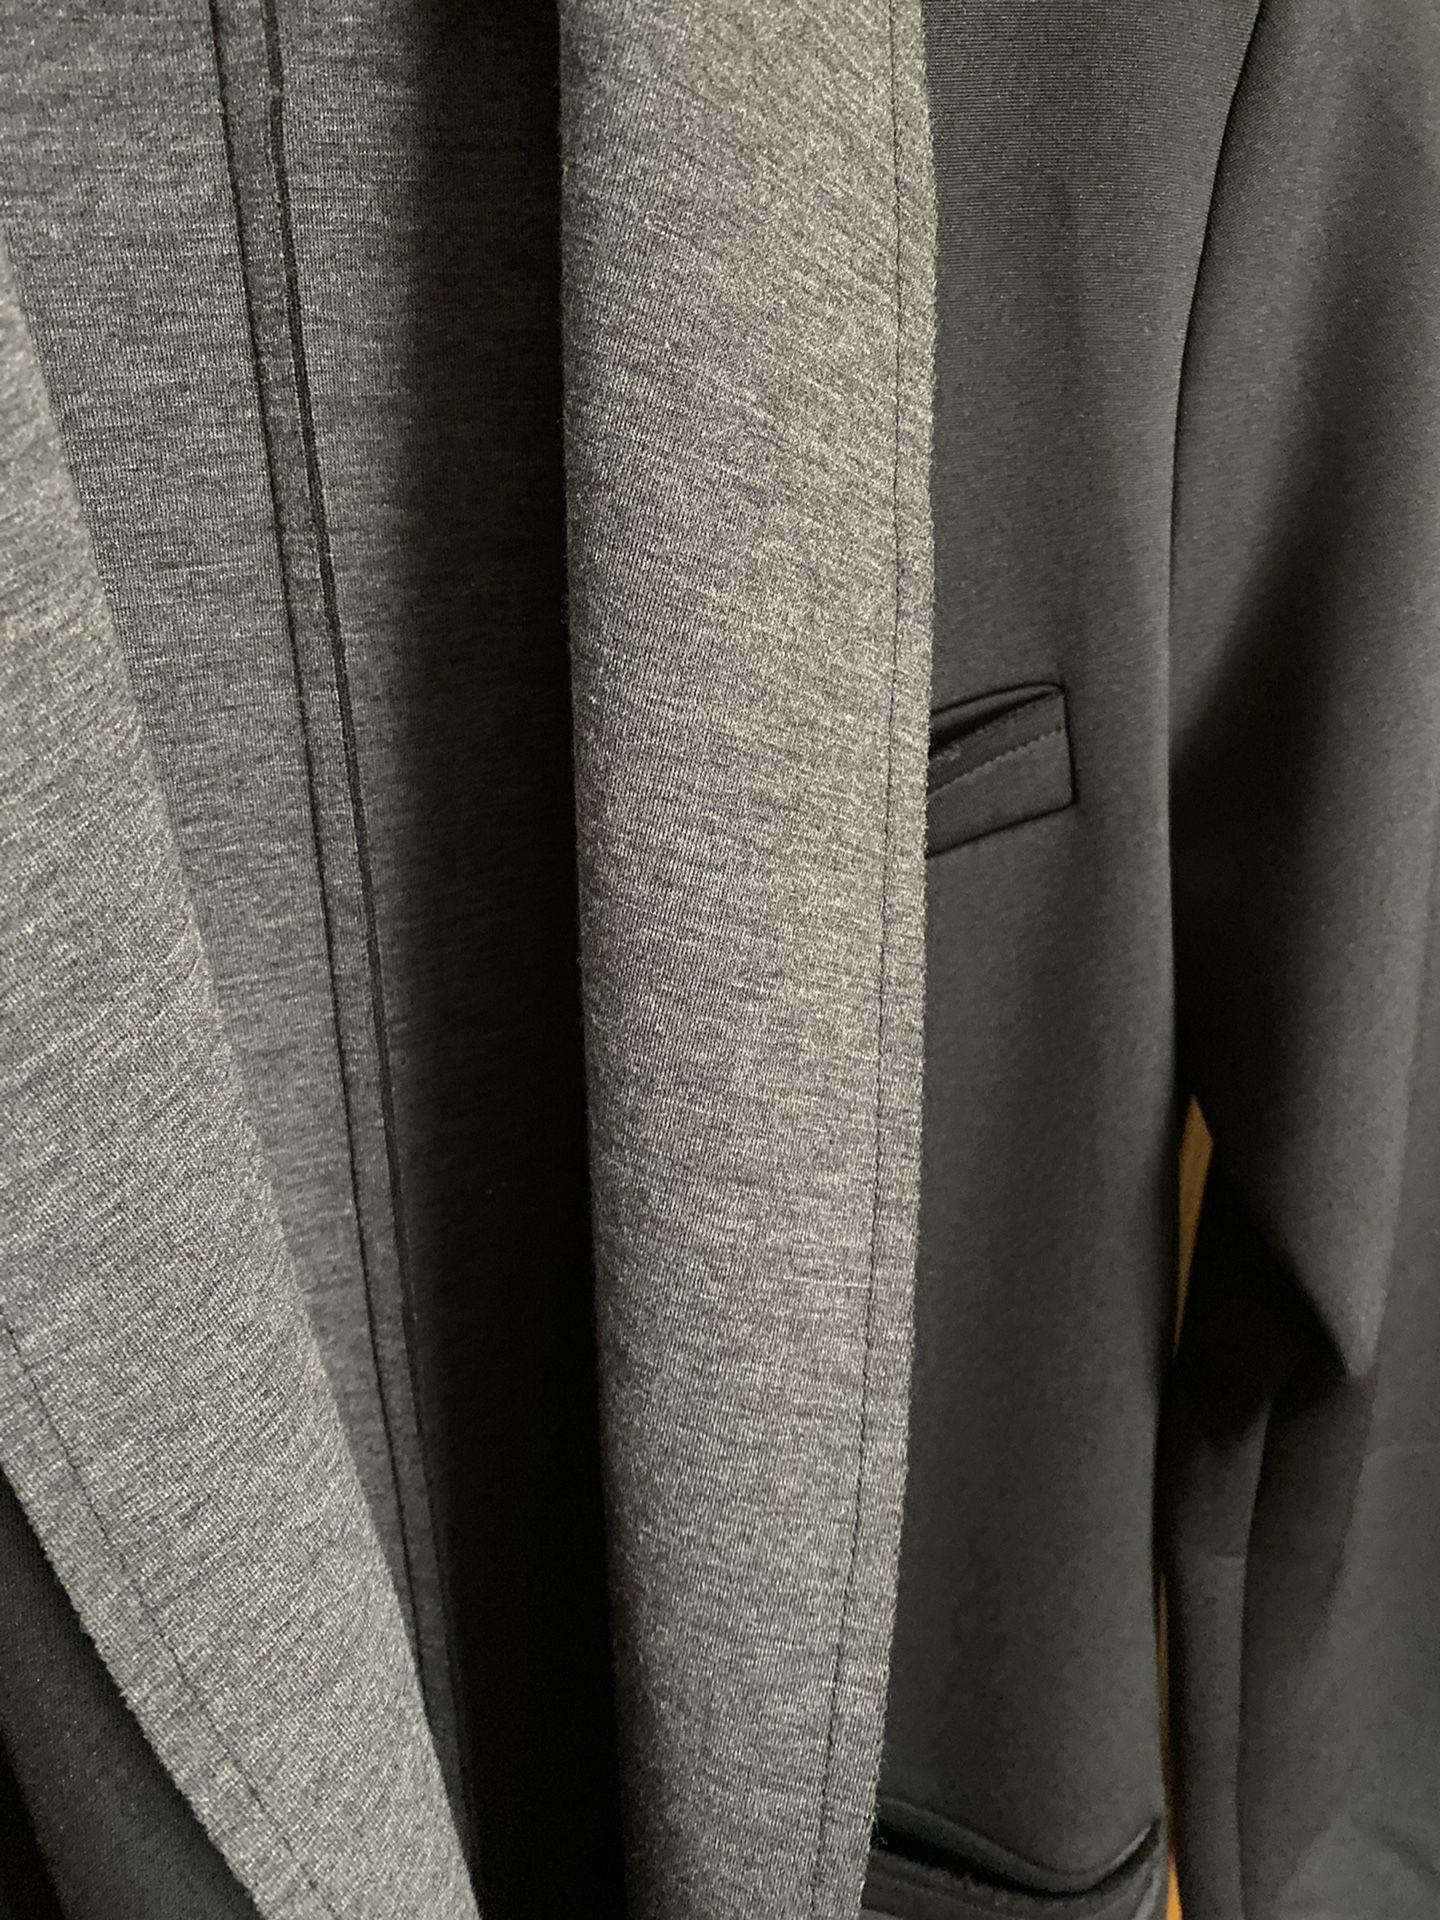 Secil store black blazer